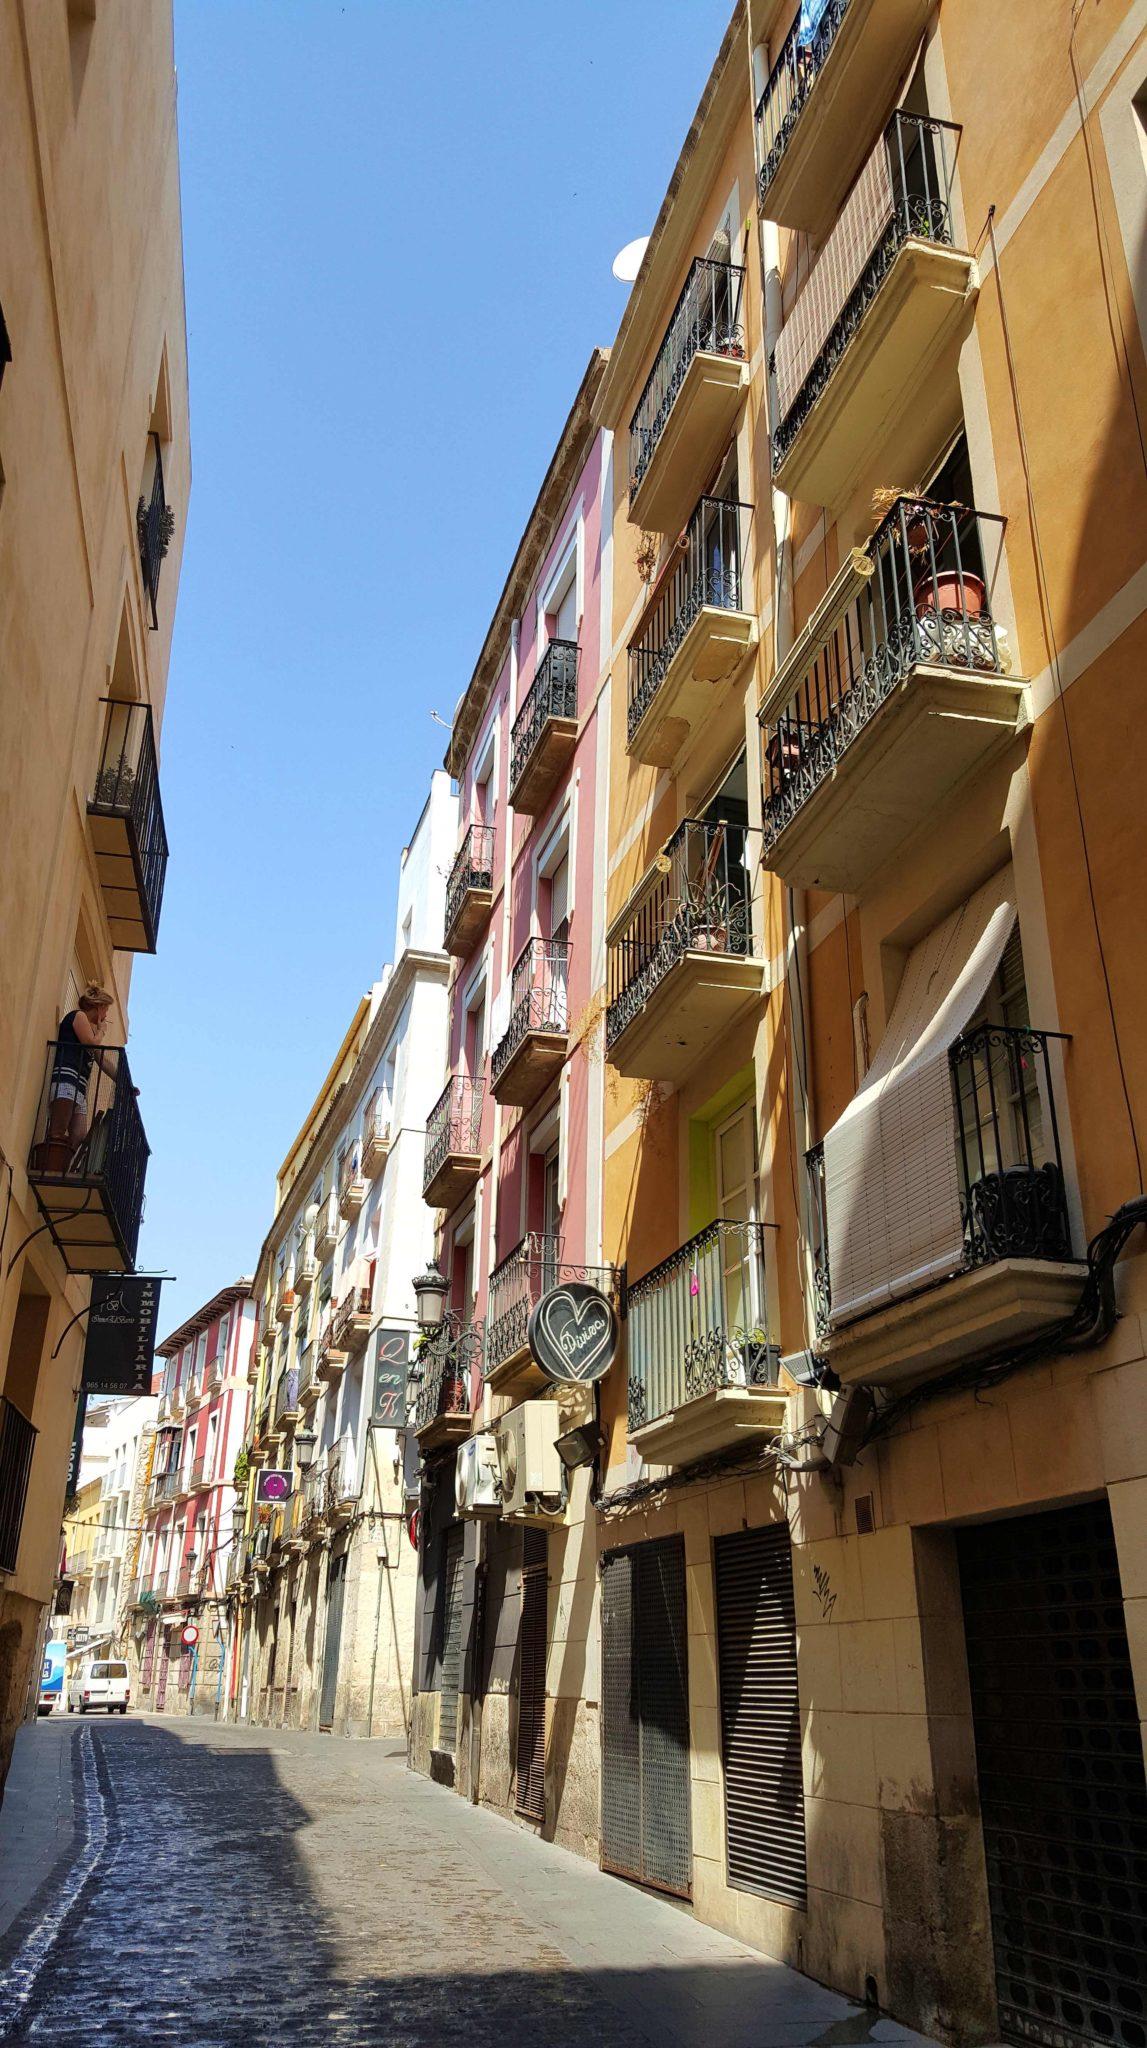 Calle de Montengon - Alicante - Espanha © Viaje Comigo